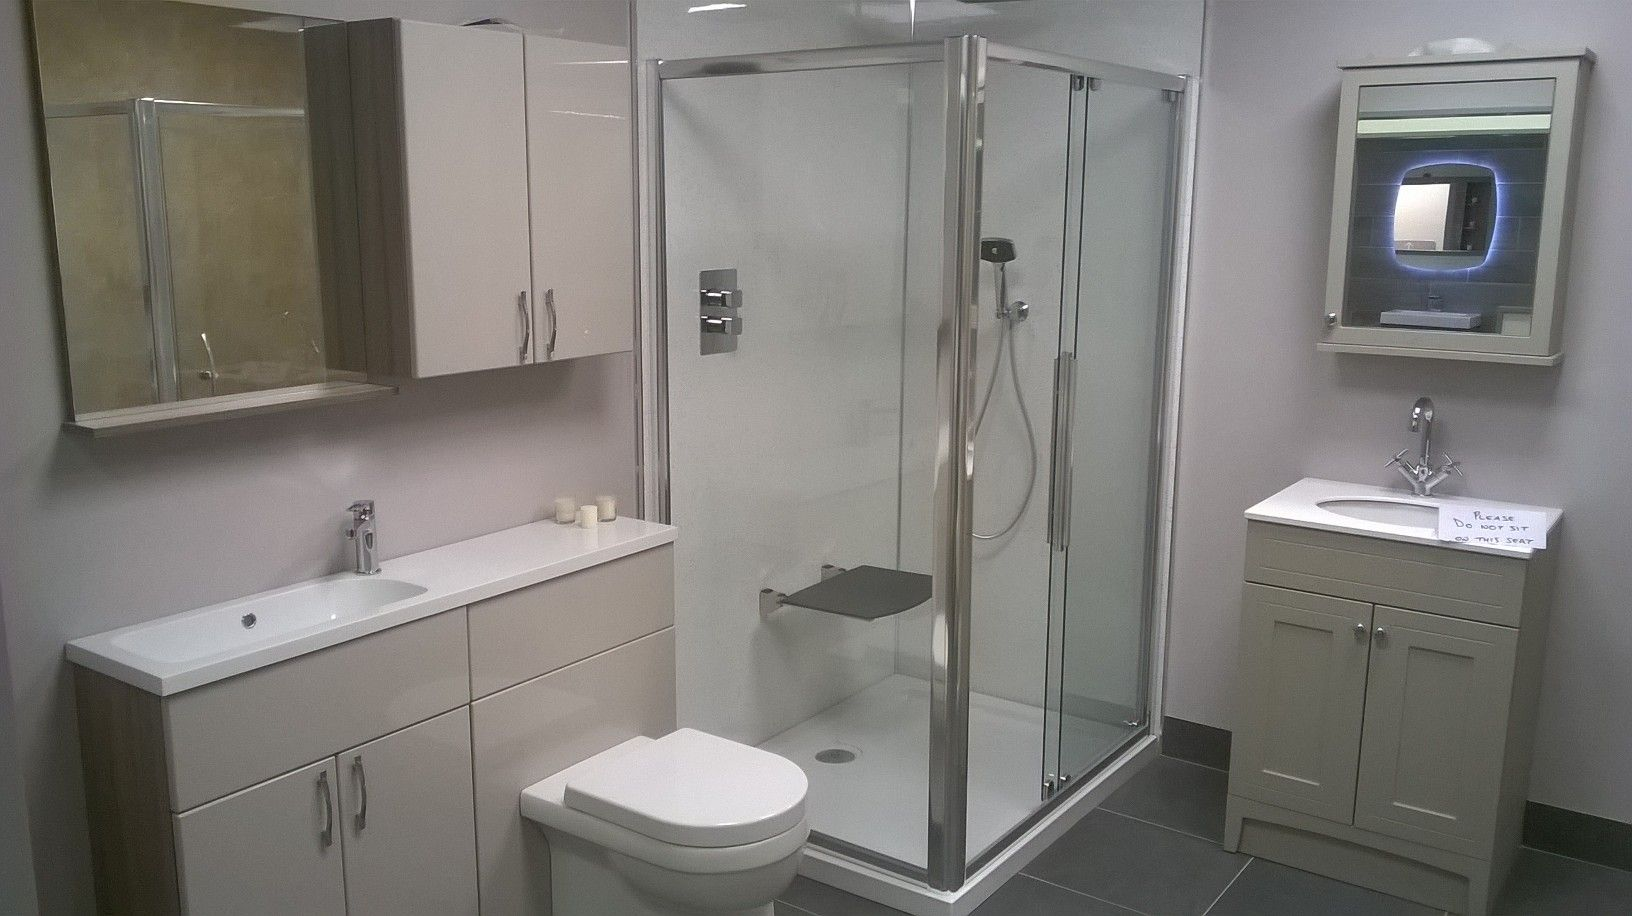 Buildbase Bathroom Showrooms Modern Bathroom Design Bathroom Showrooms Bathroom Design